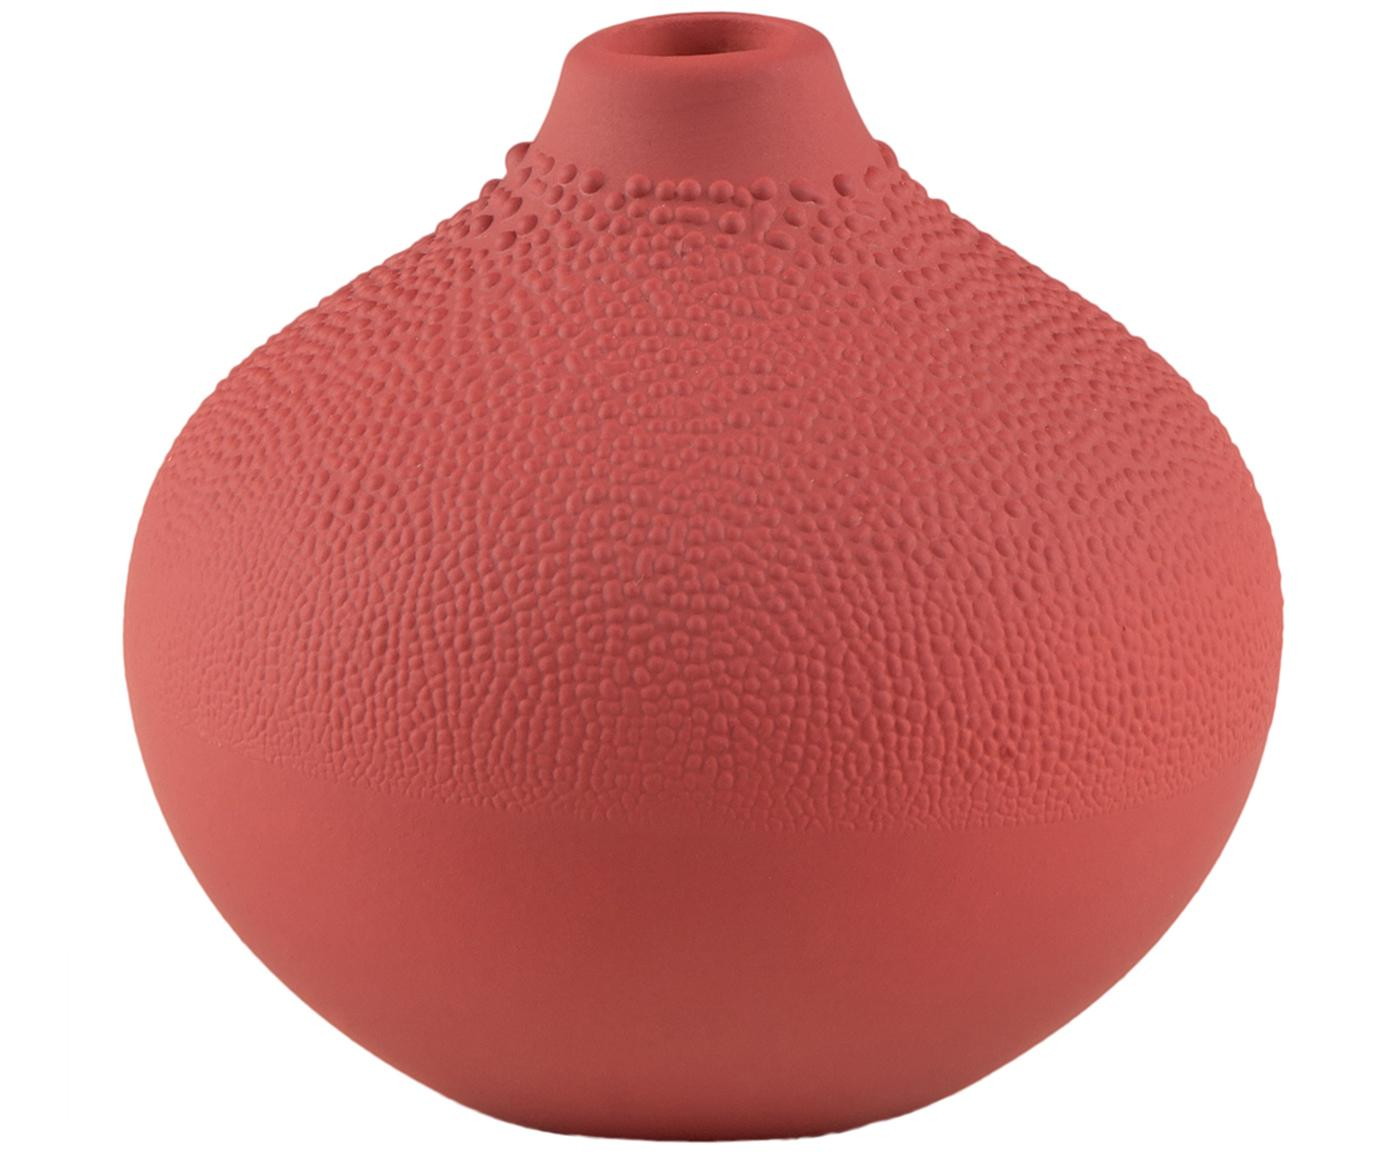 XS Vase Design aus Porzellan, Porzellan, Rostrot, Ø 7 x H 7 cm